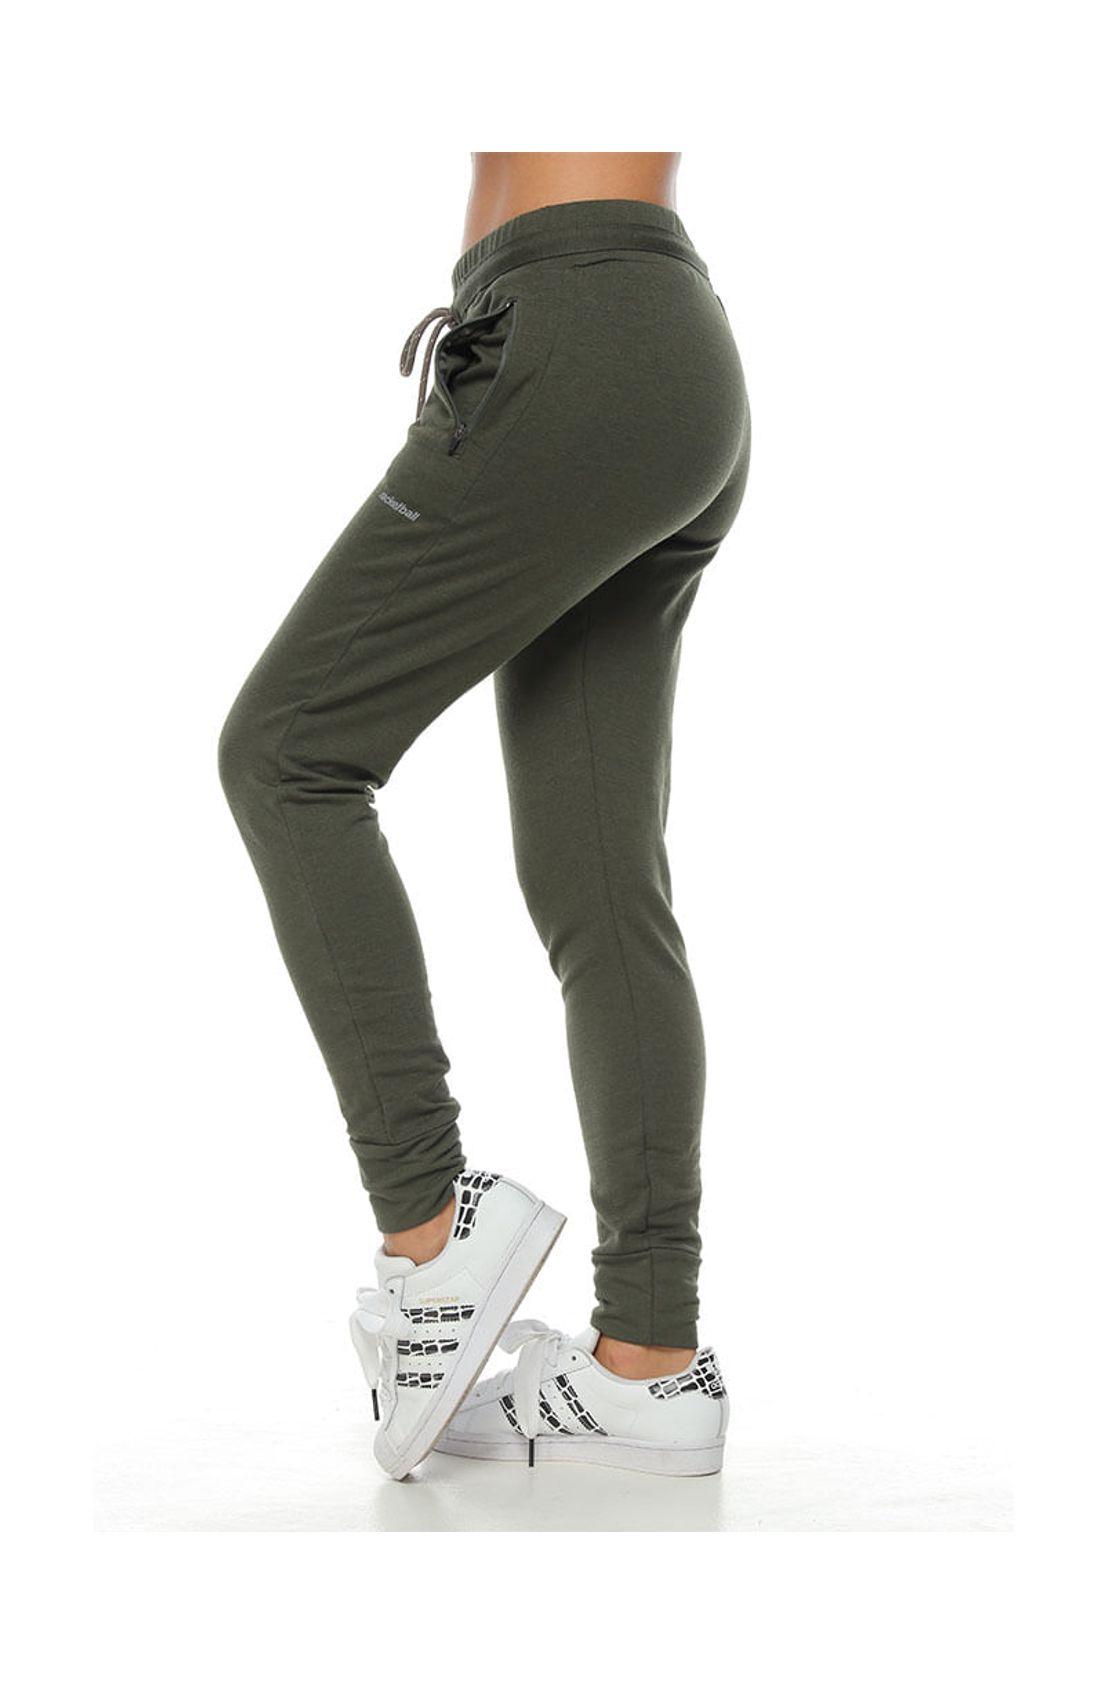 Pantalon Jogger Color Verde Para Mujer Tennis